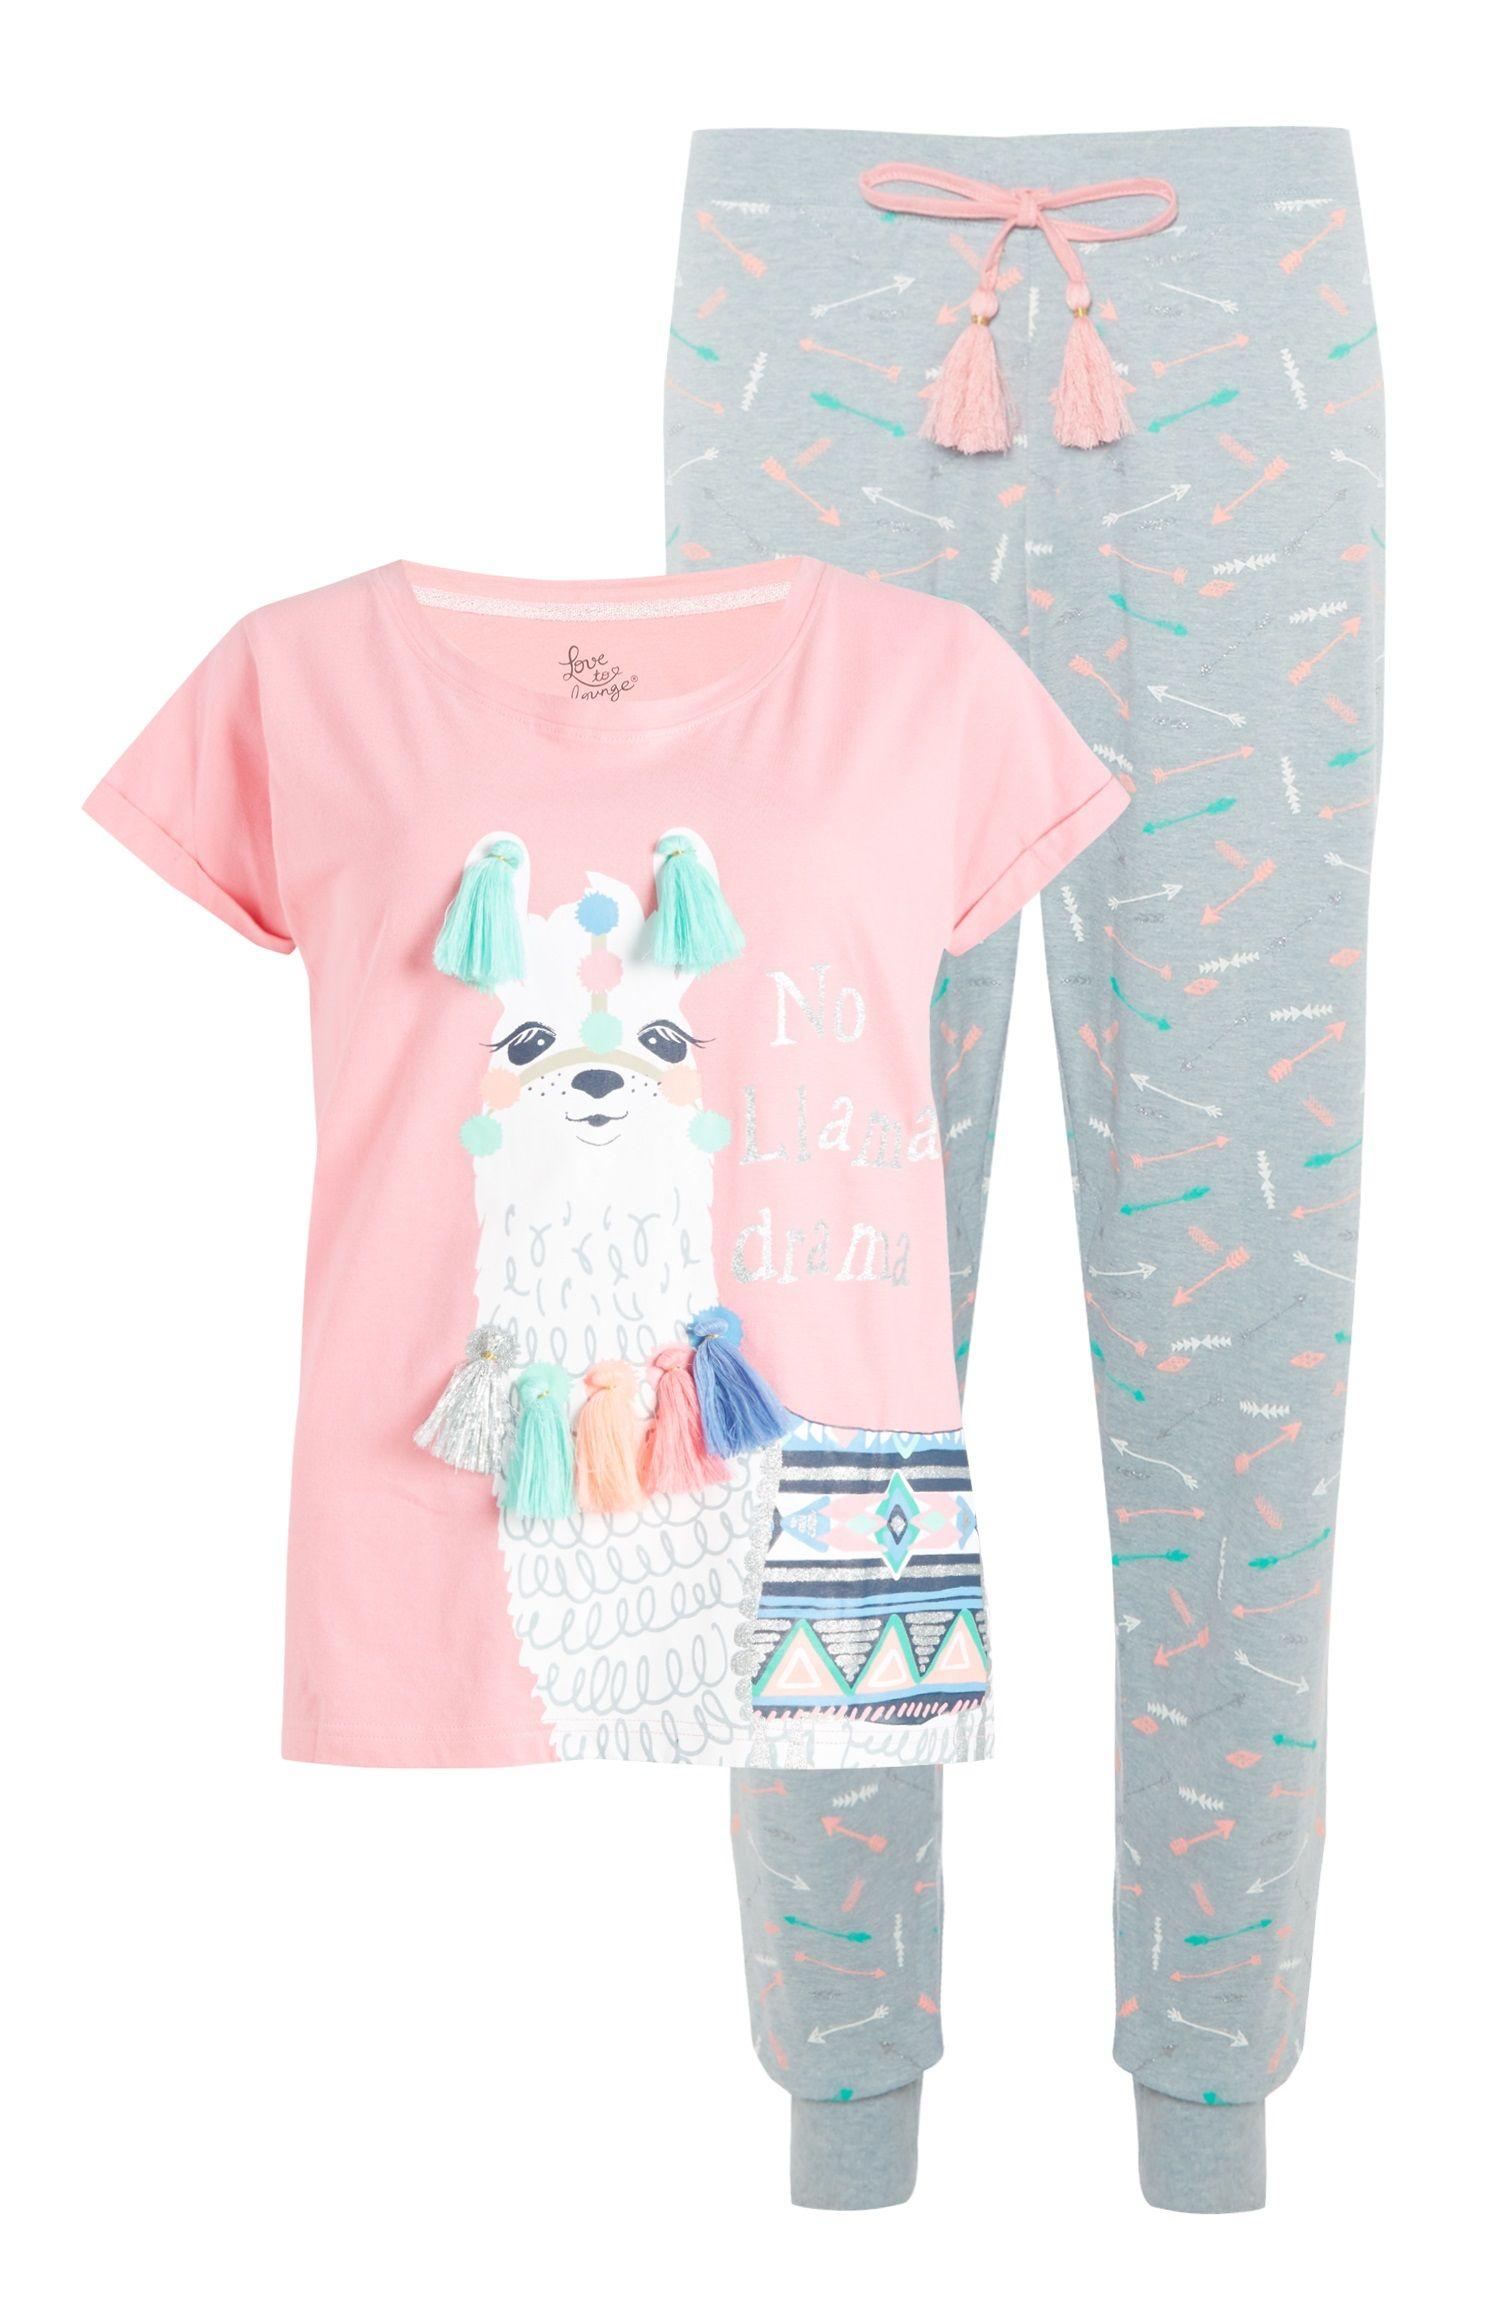 bac9fad03d Piyama llama Pijamas Para Niñas